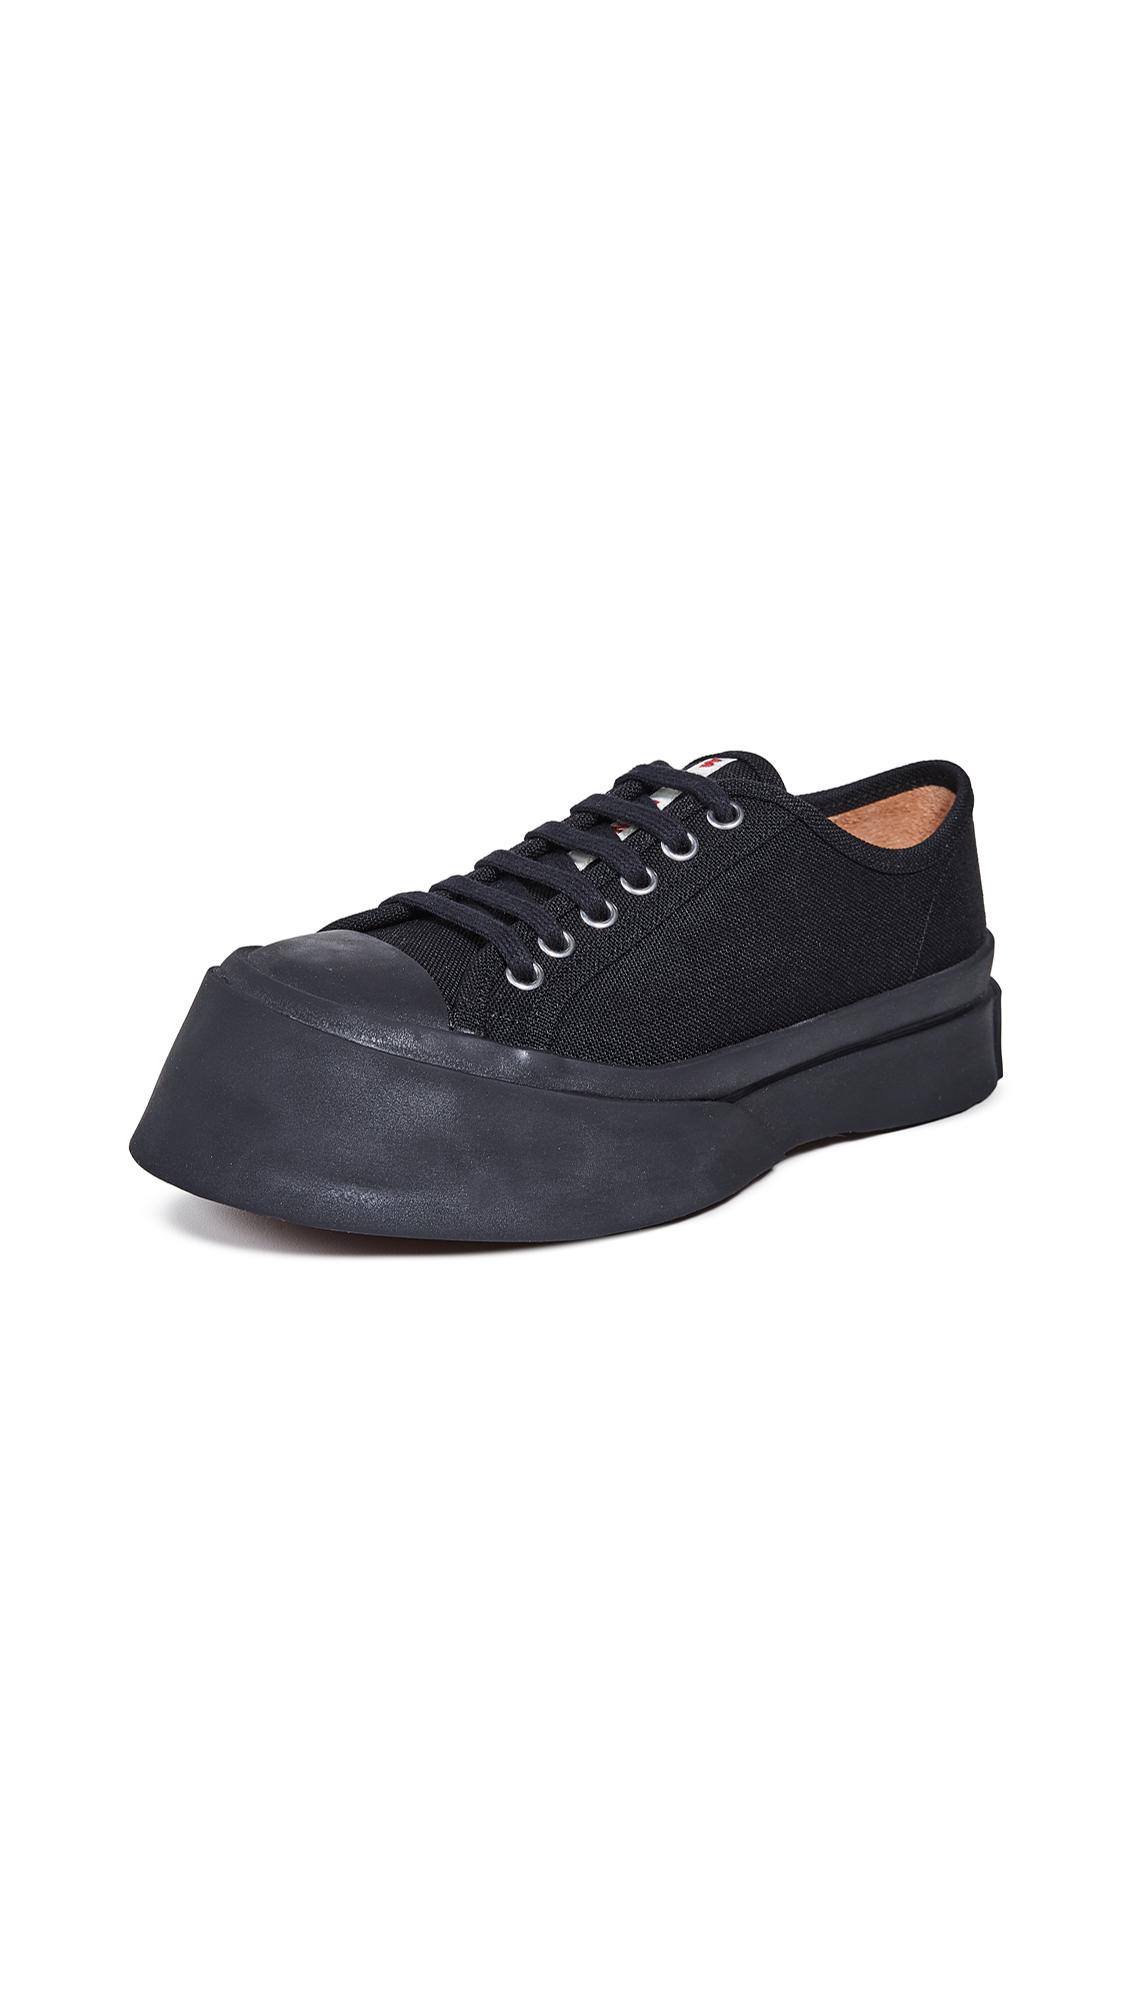 Marni Classic Sneakers - Black